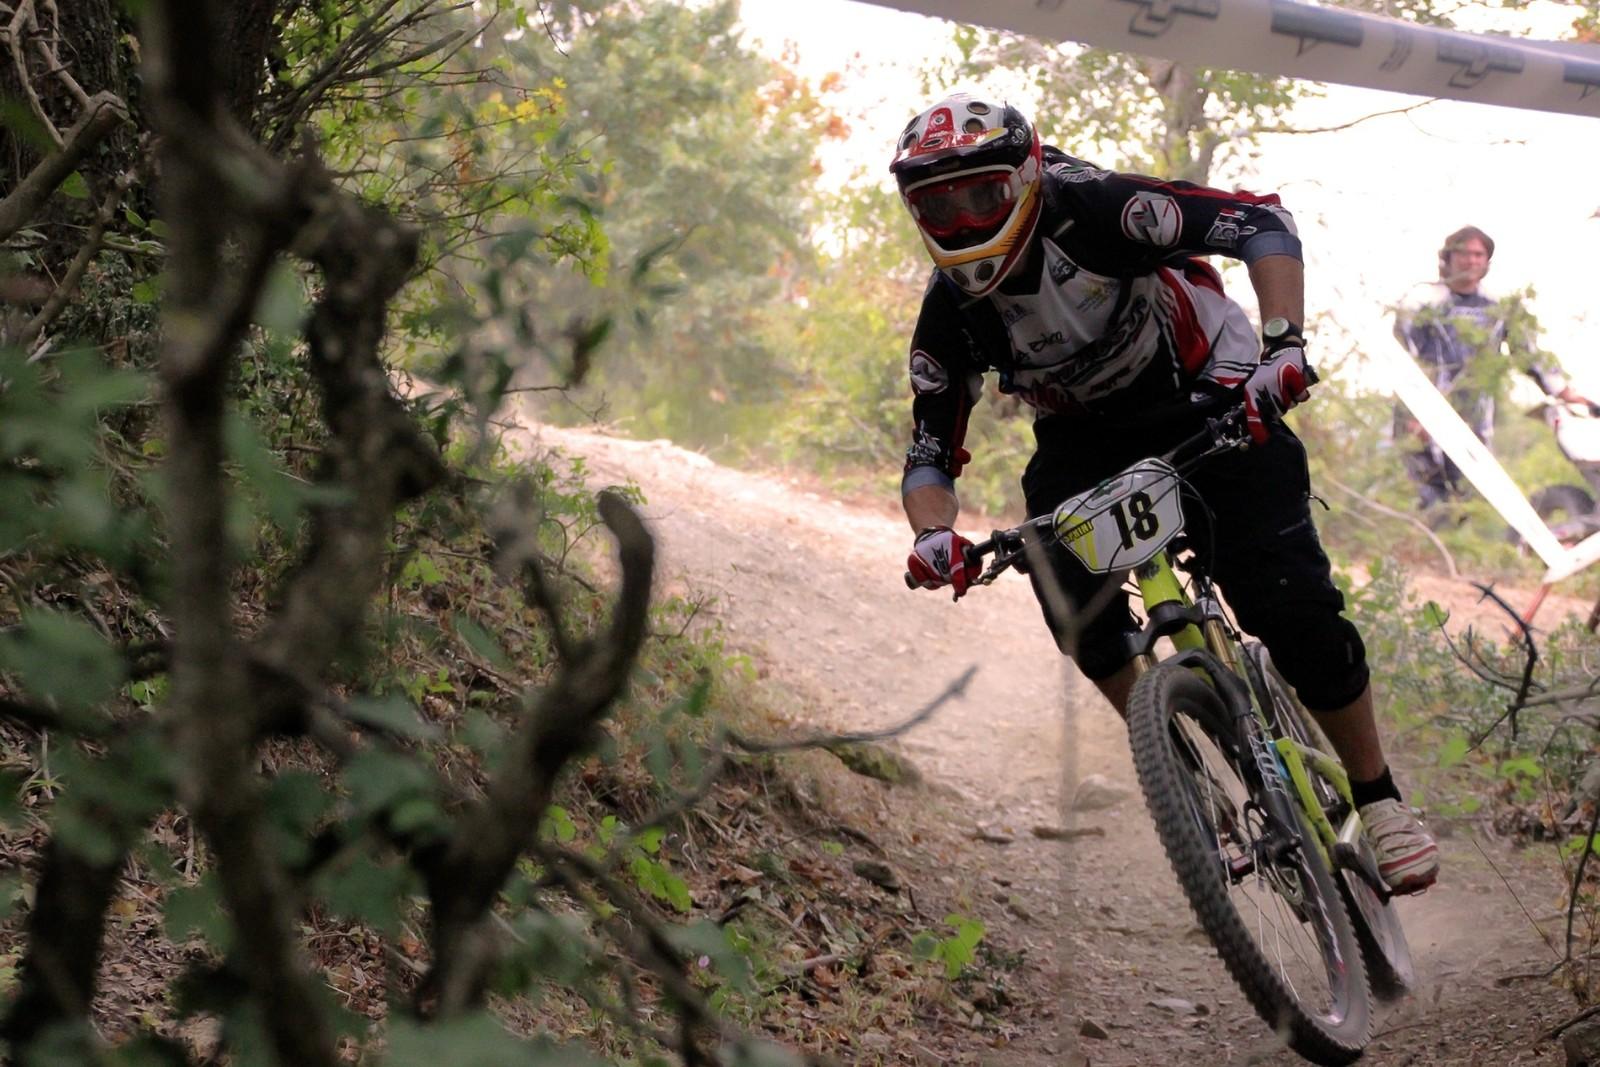 Super Enduro Tolfa 03 - Ruggero - Mountain Biking Pictures - Vital MTB